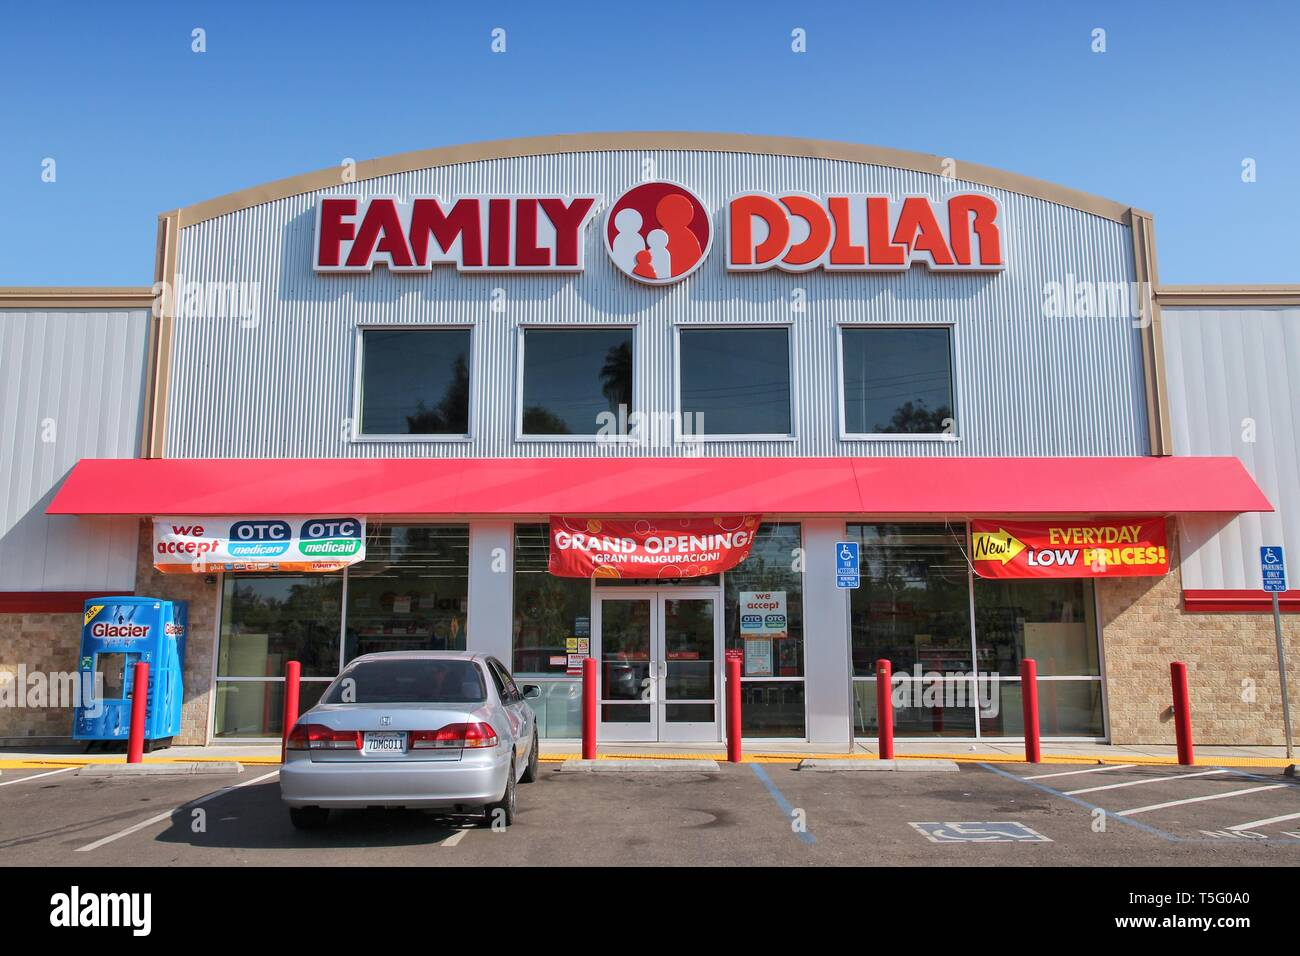 Family Dollar Store Stock Photos & Family Dollar Store Stock